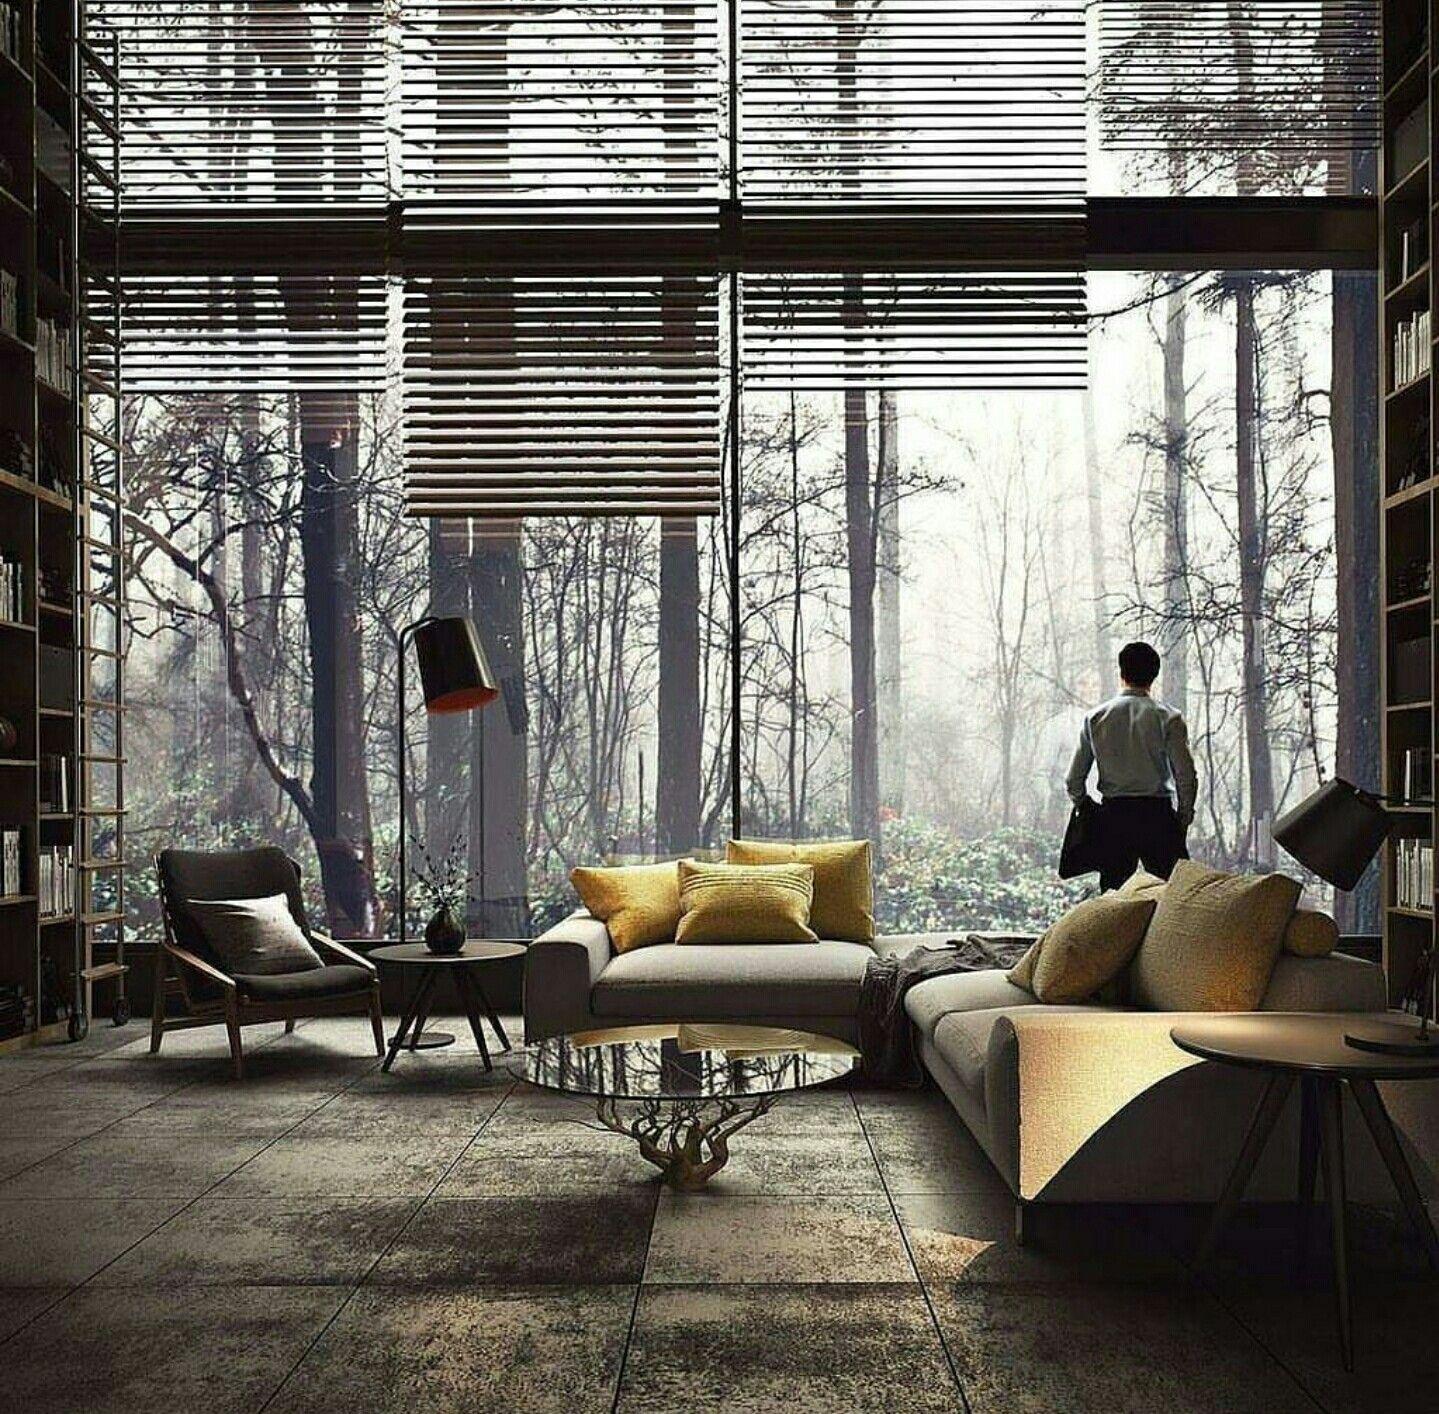 Interior Designed Living Rooms Pinstefan Wessel On Design  Pinterest  Lofts And Interiors